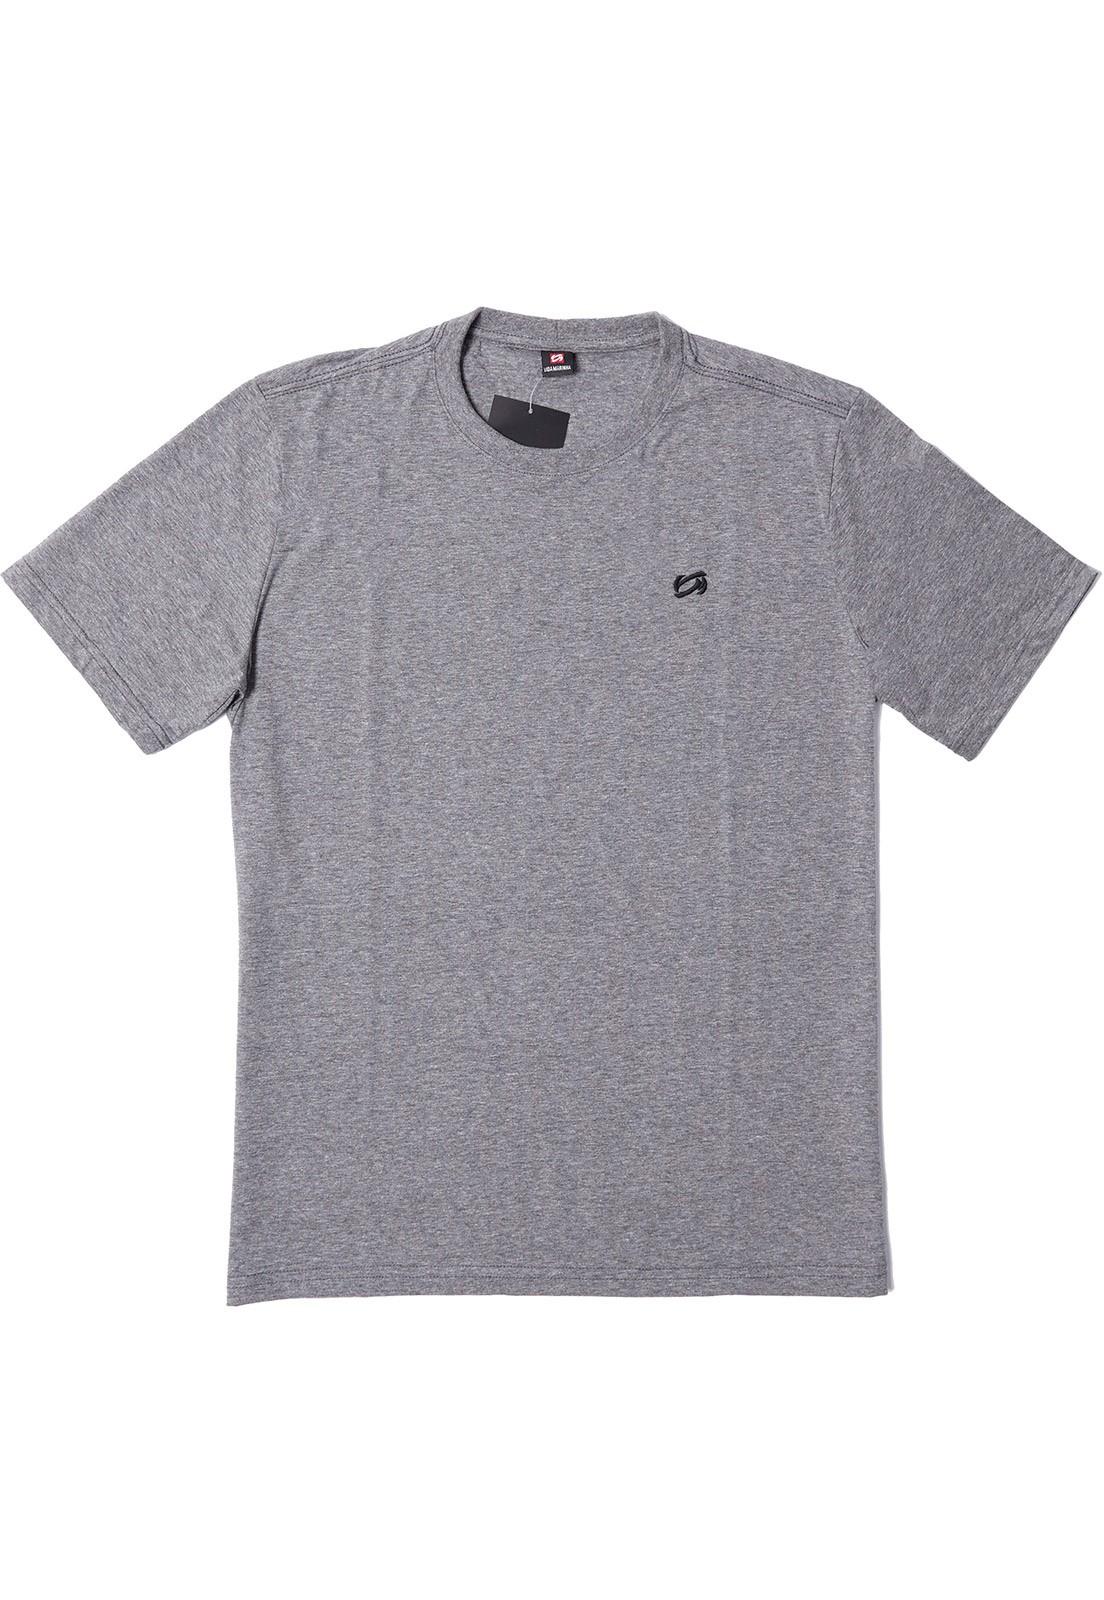 Camiseta Vida Marinha Manga Curta Básica Cinza